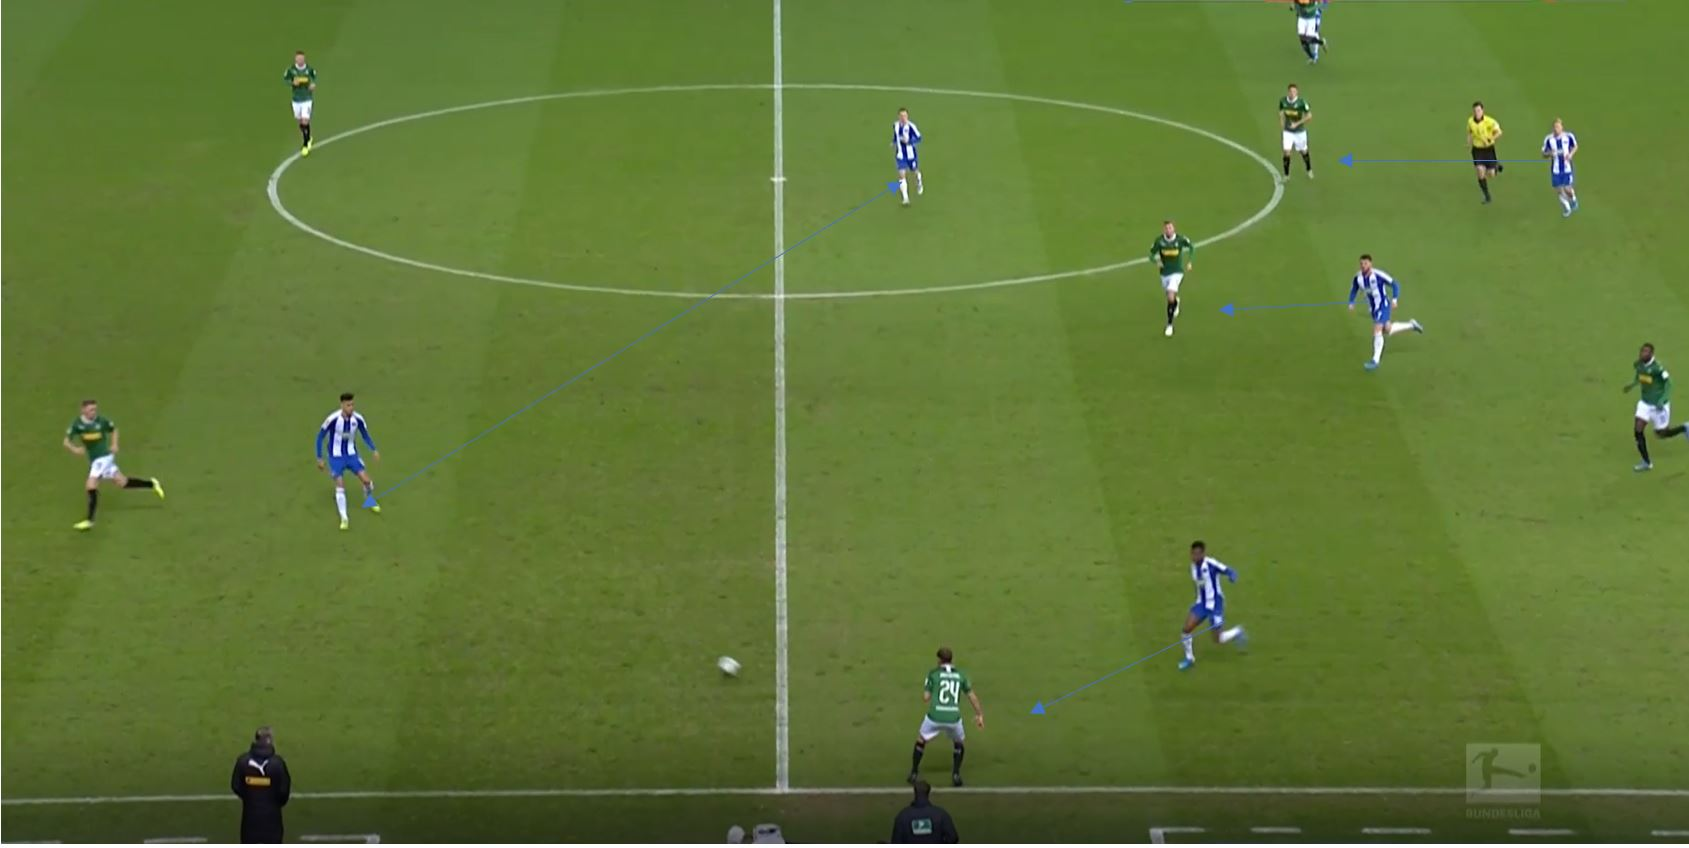 Bundesliga 2019/20: Hertha Berlin vs Borussia Monchengladbach- tactical analysis tactics